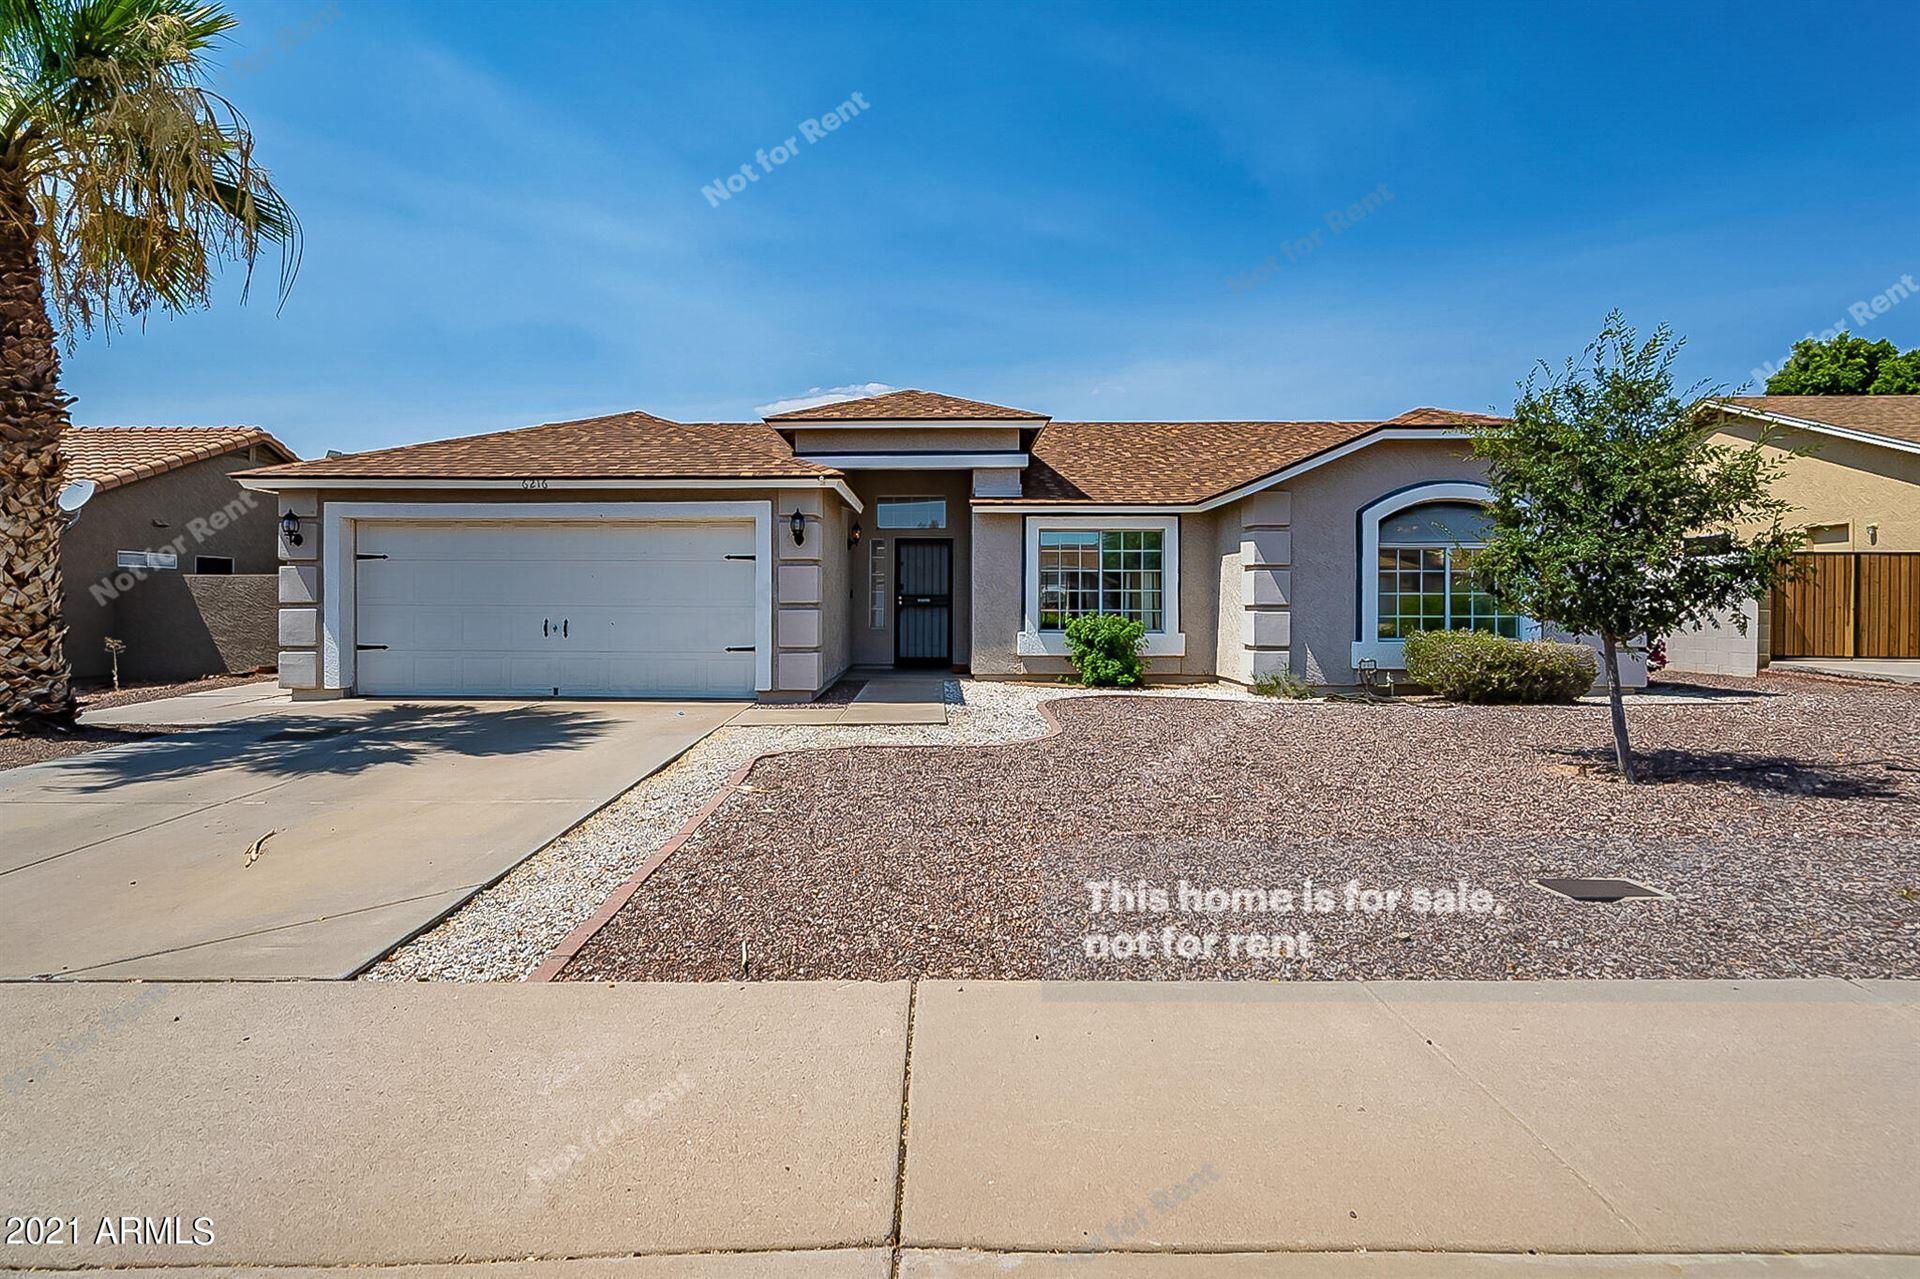 6216 E GRANDVIEW Street, Mesa, AZ 85205 - MLS#: 6257006